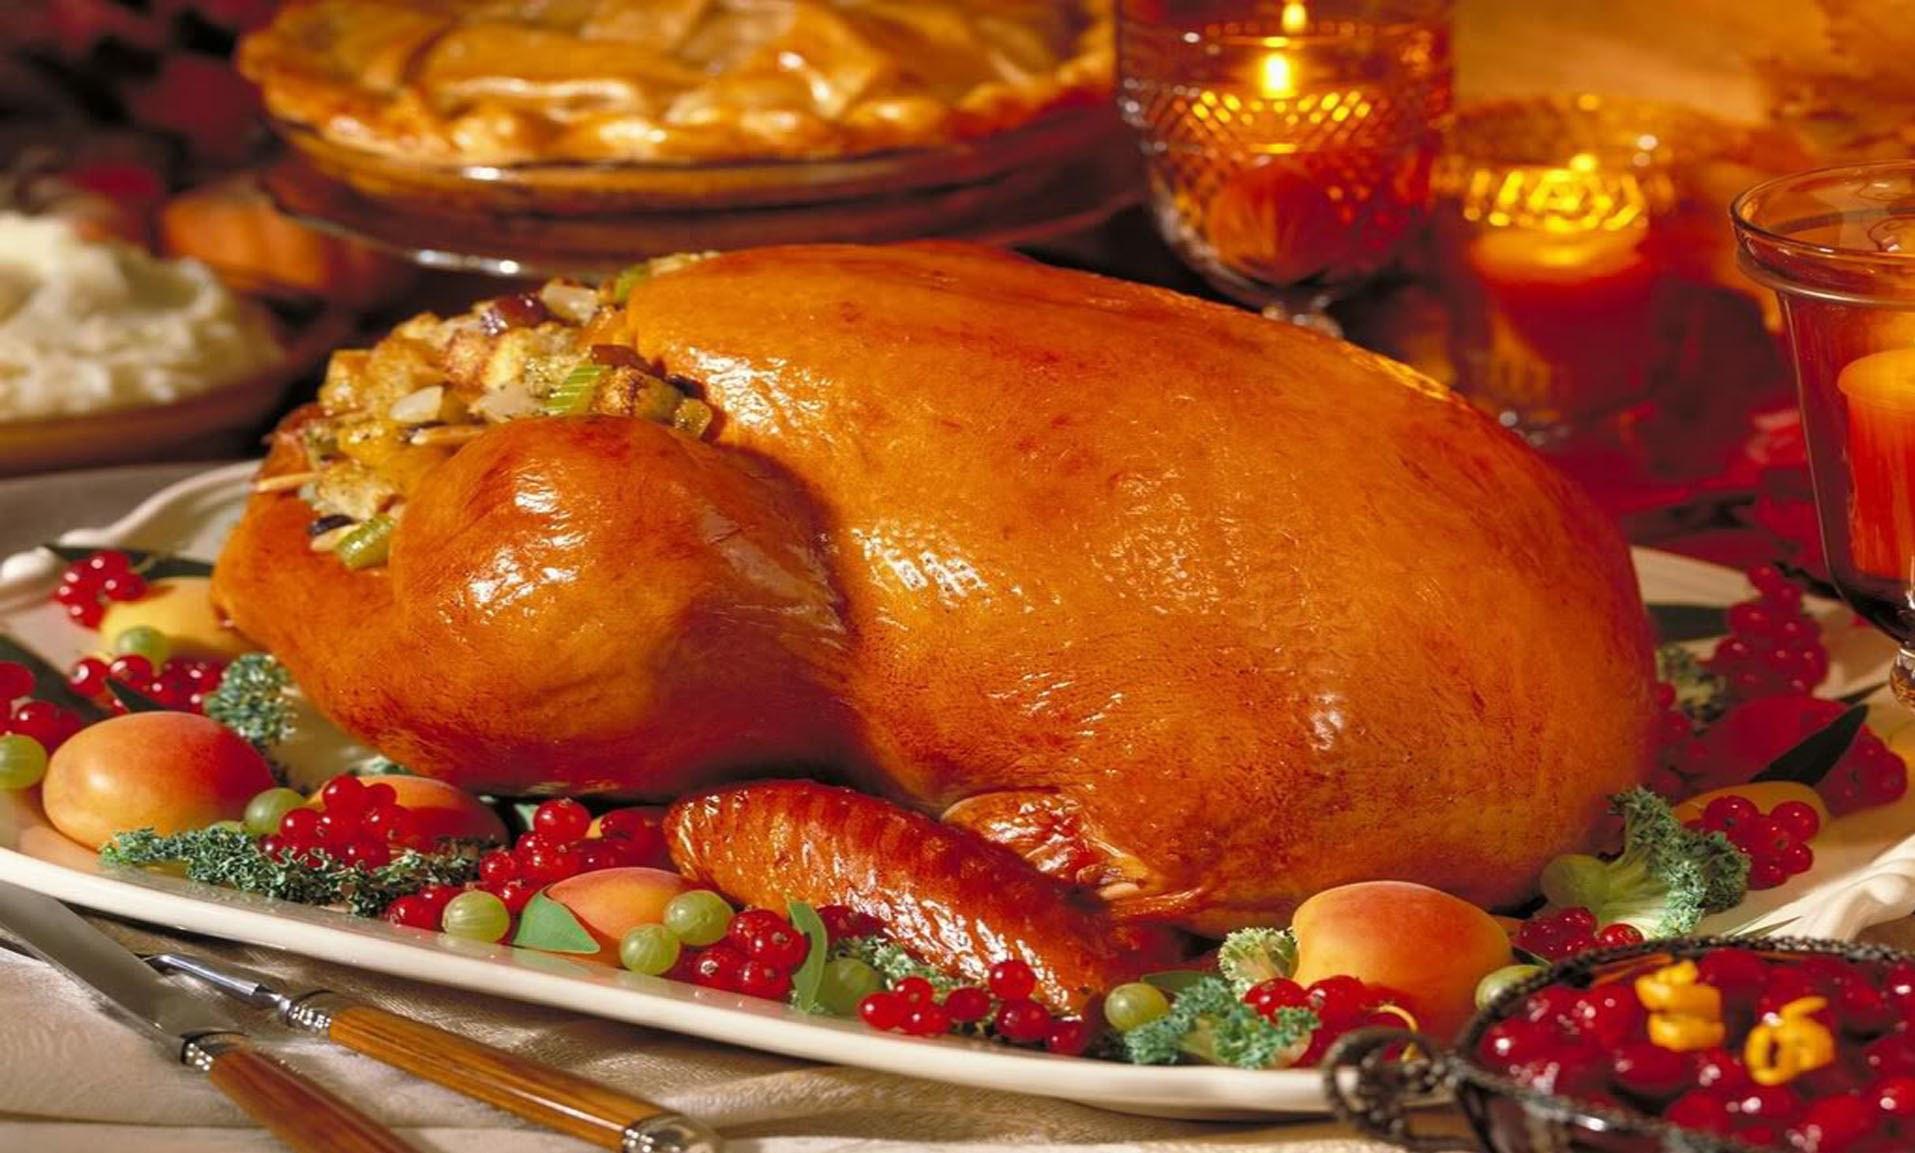 Pics Of Thanksgiving Turkey  Thanksgiving Roasted Turkey